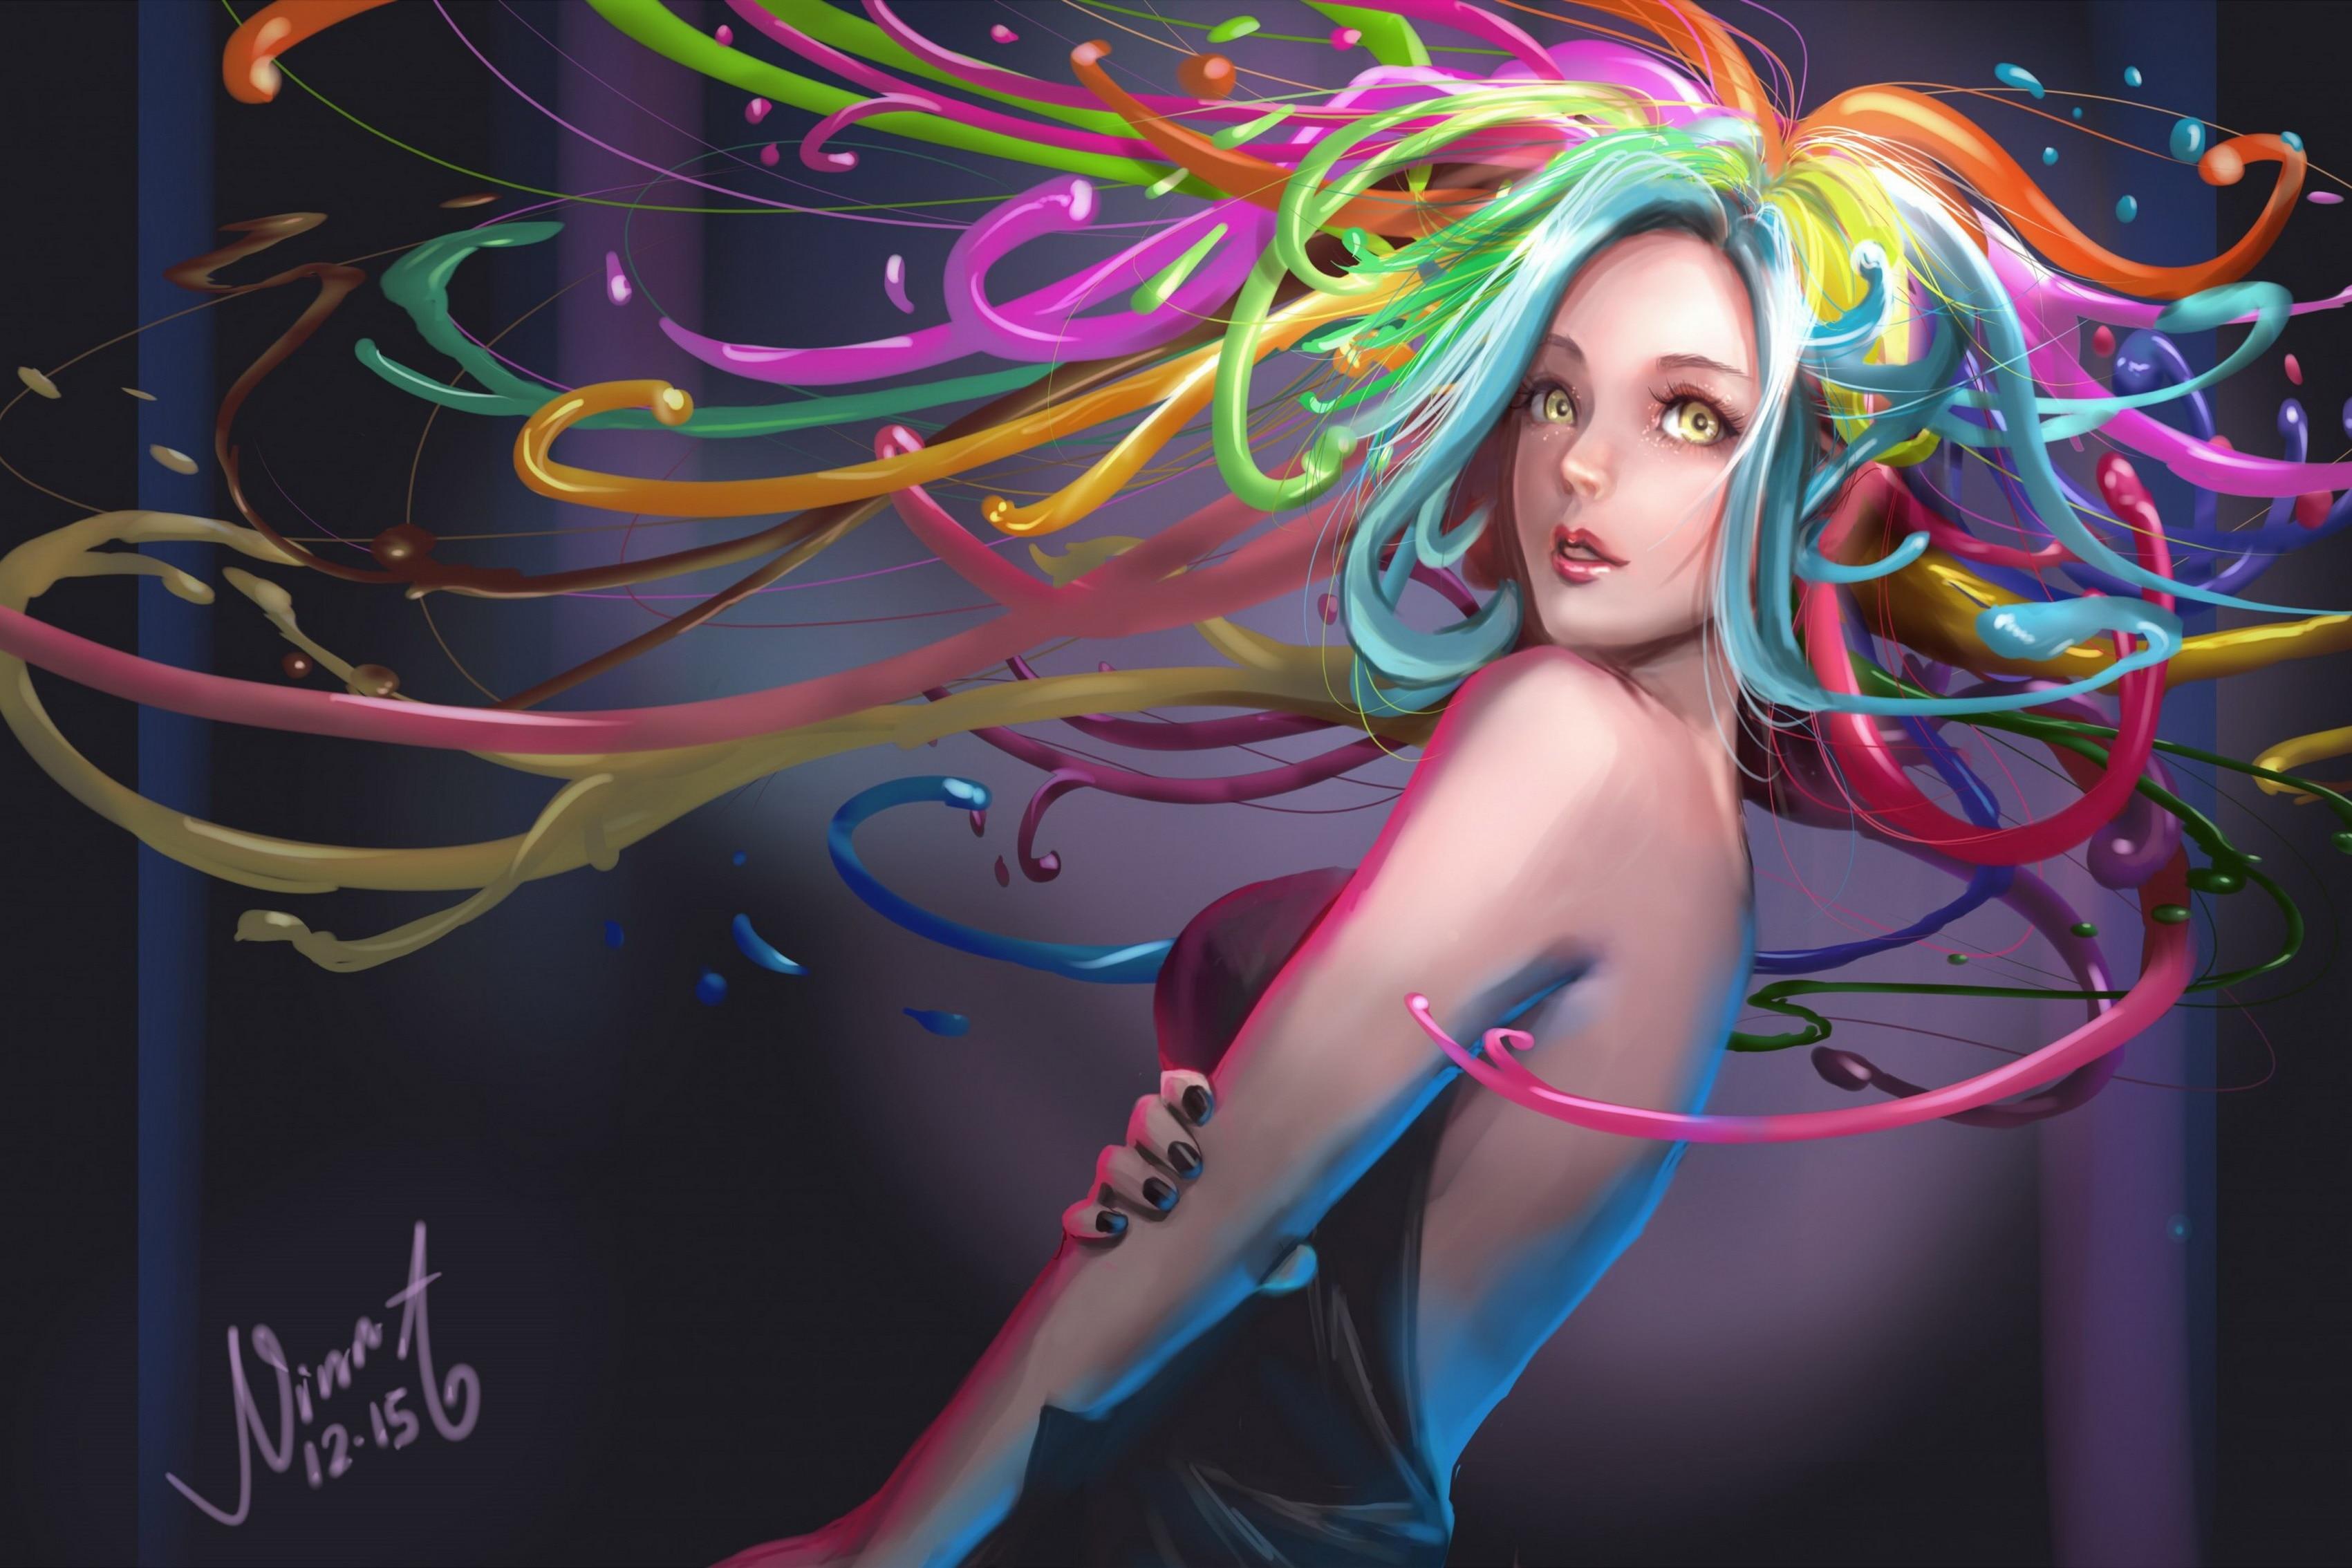 Art color hair - Home Decoration Anime Art Girl Glance Hair Colors Color Silk Fabric Poster Print Dm065 China